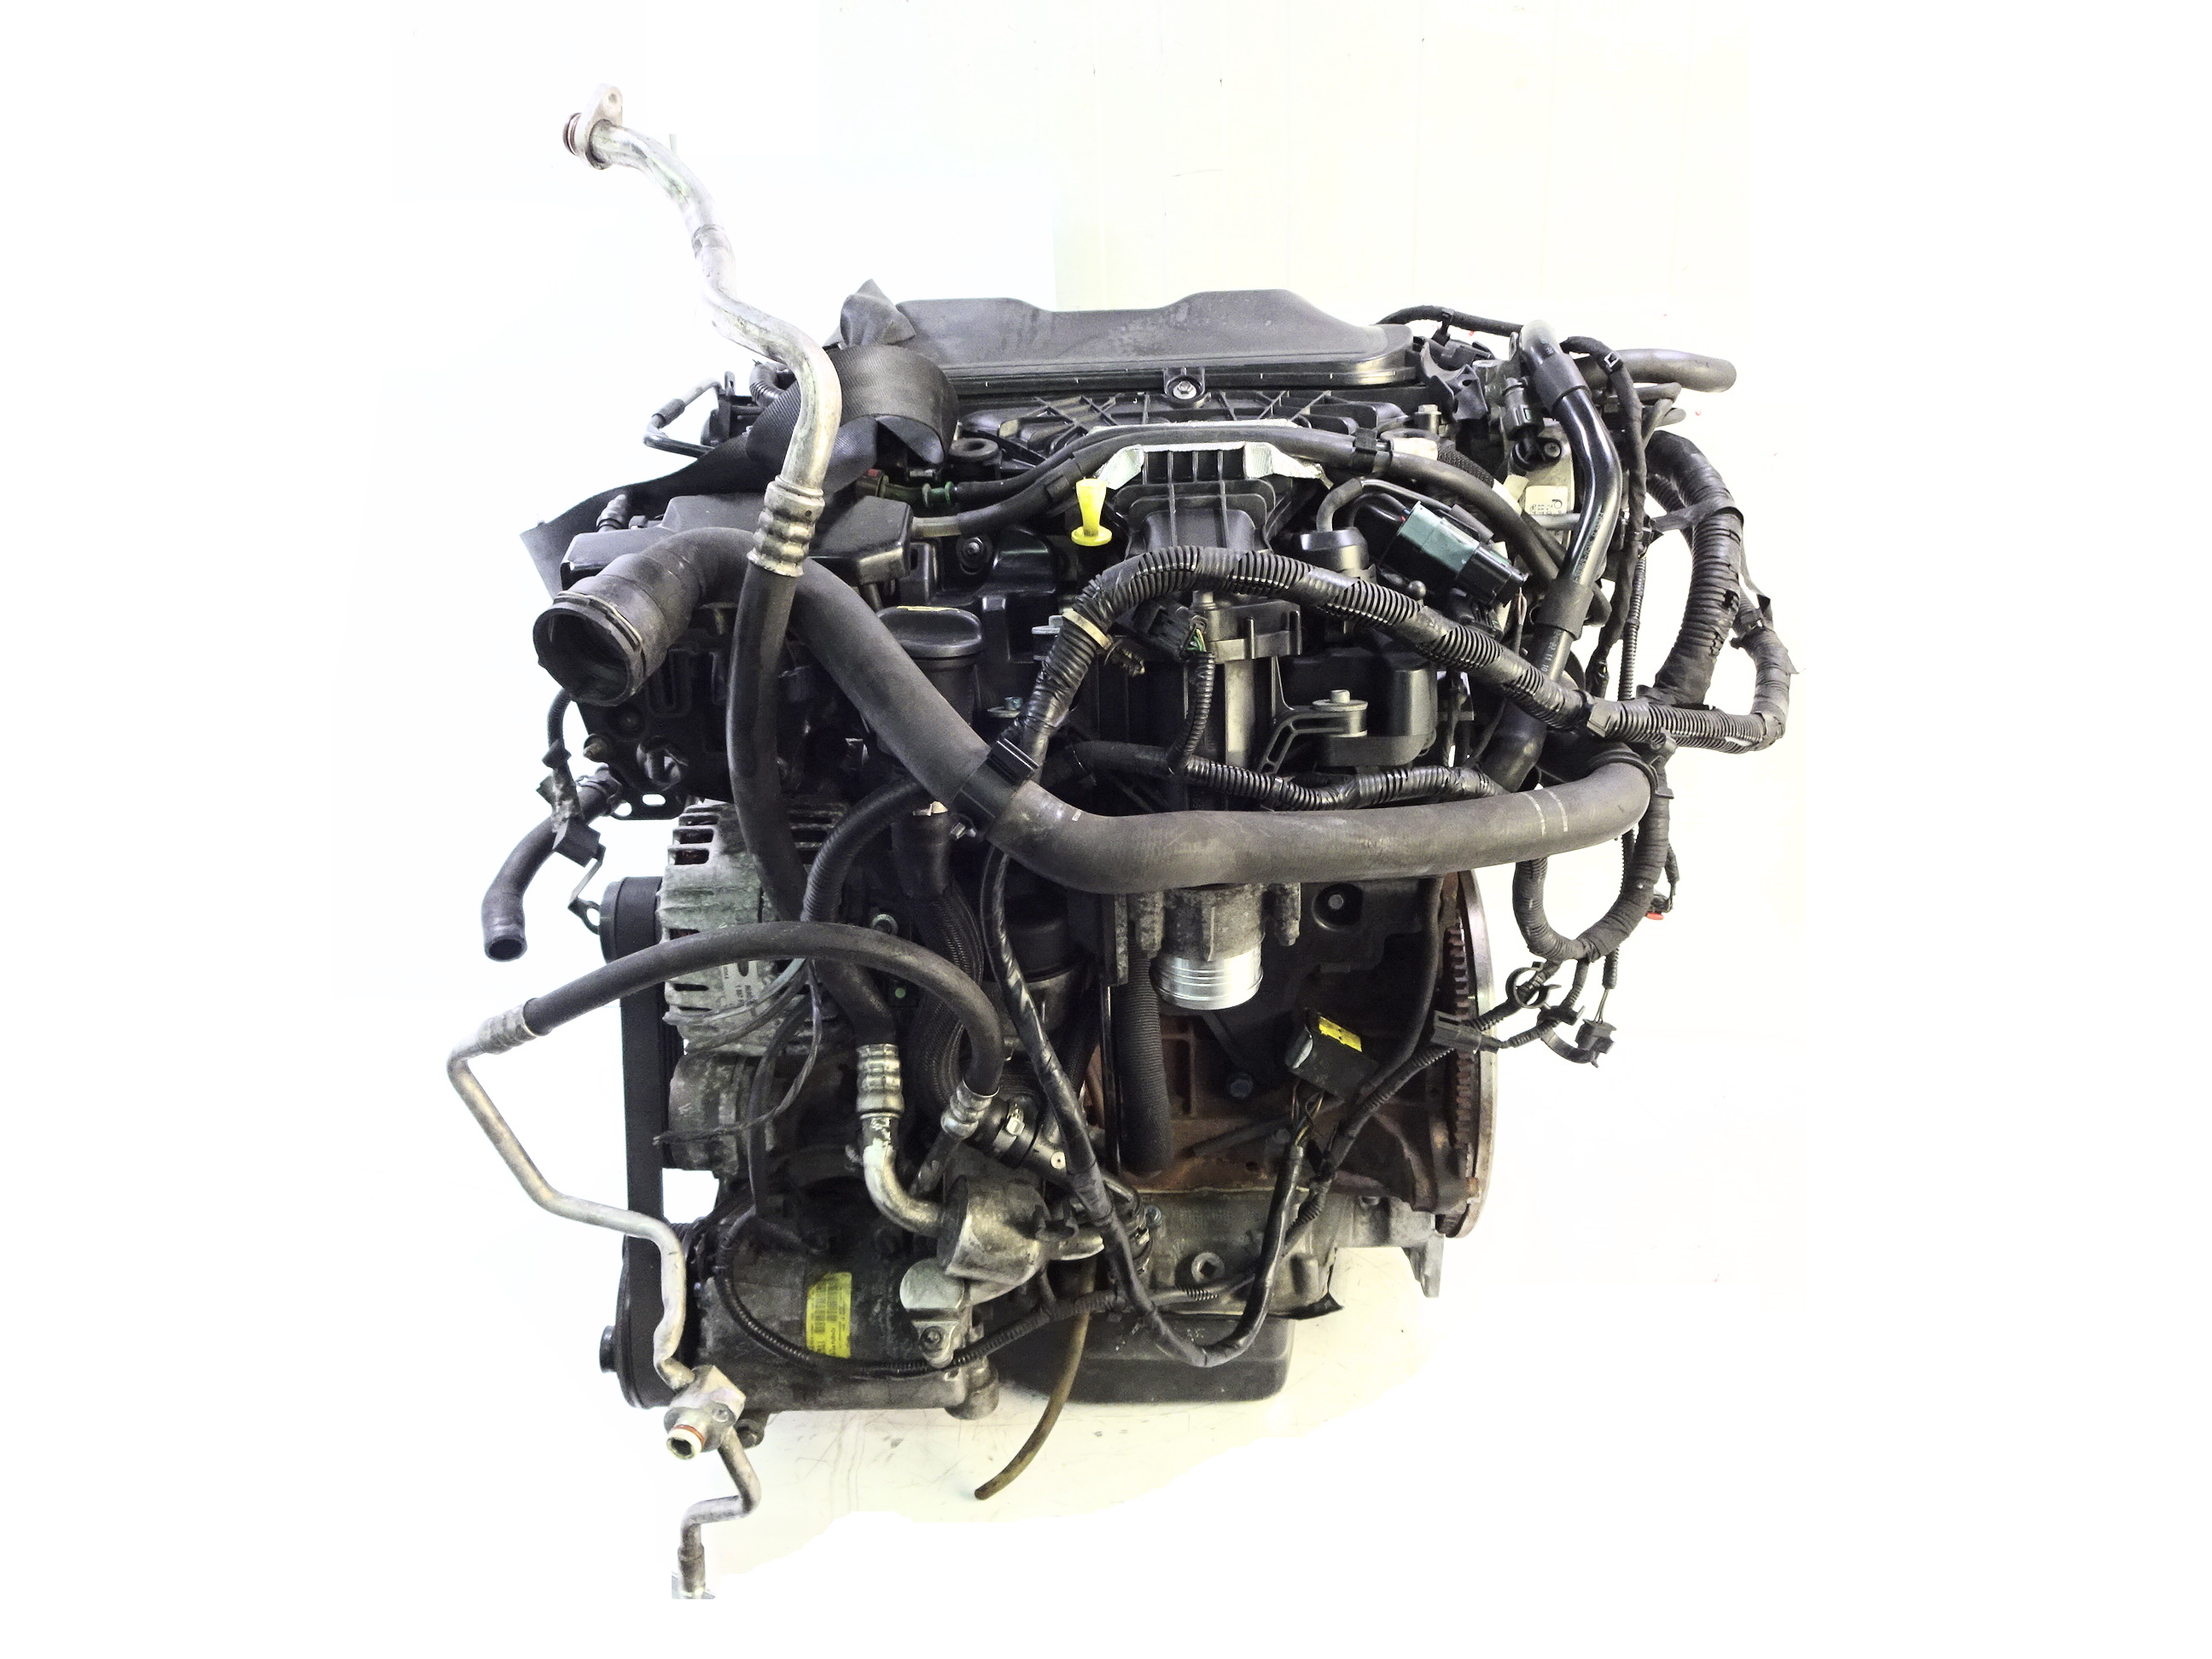 Motor 2010 Ford Galaxy S-Max 2,0 TDCI Diesel UFWA 140 PS